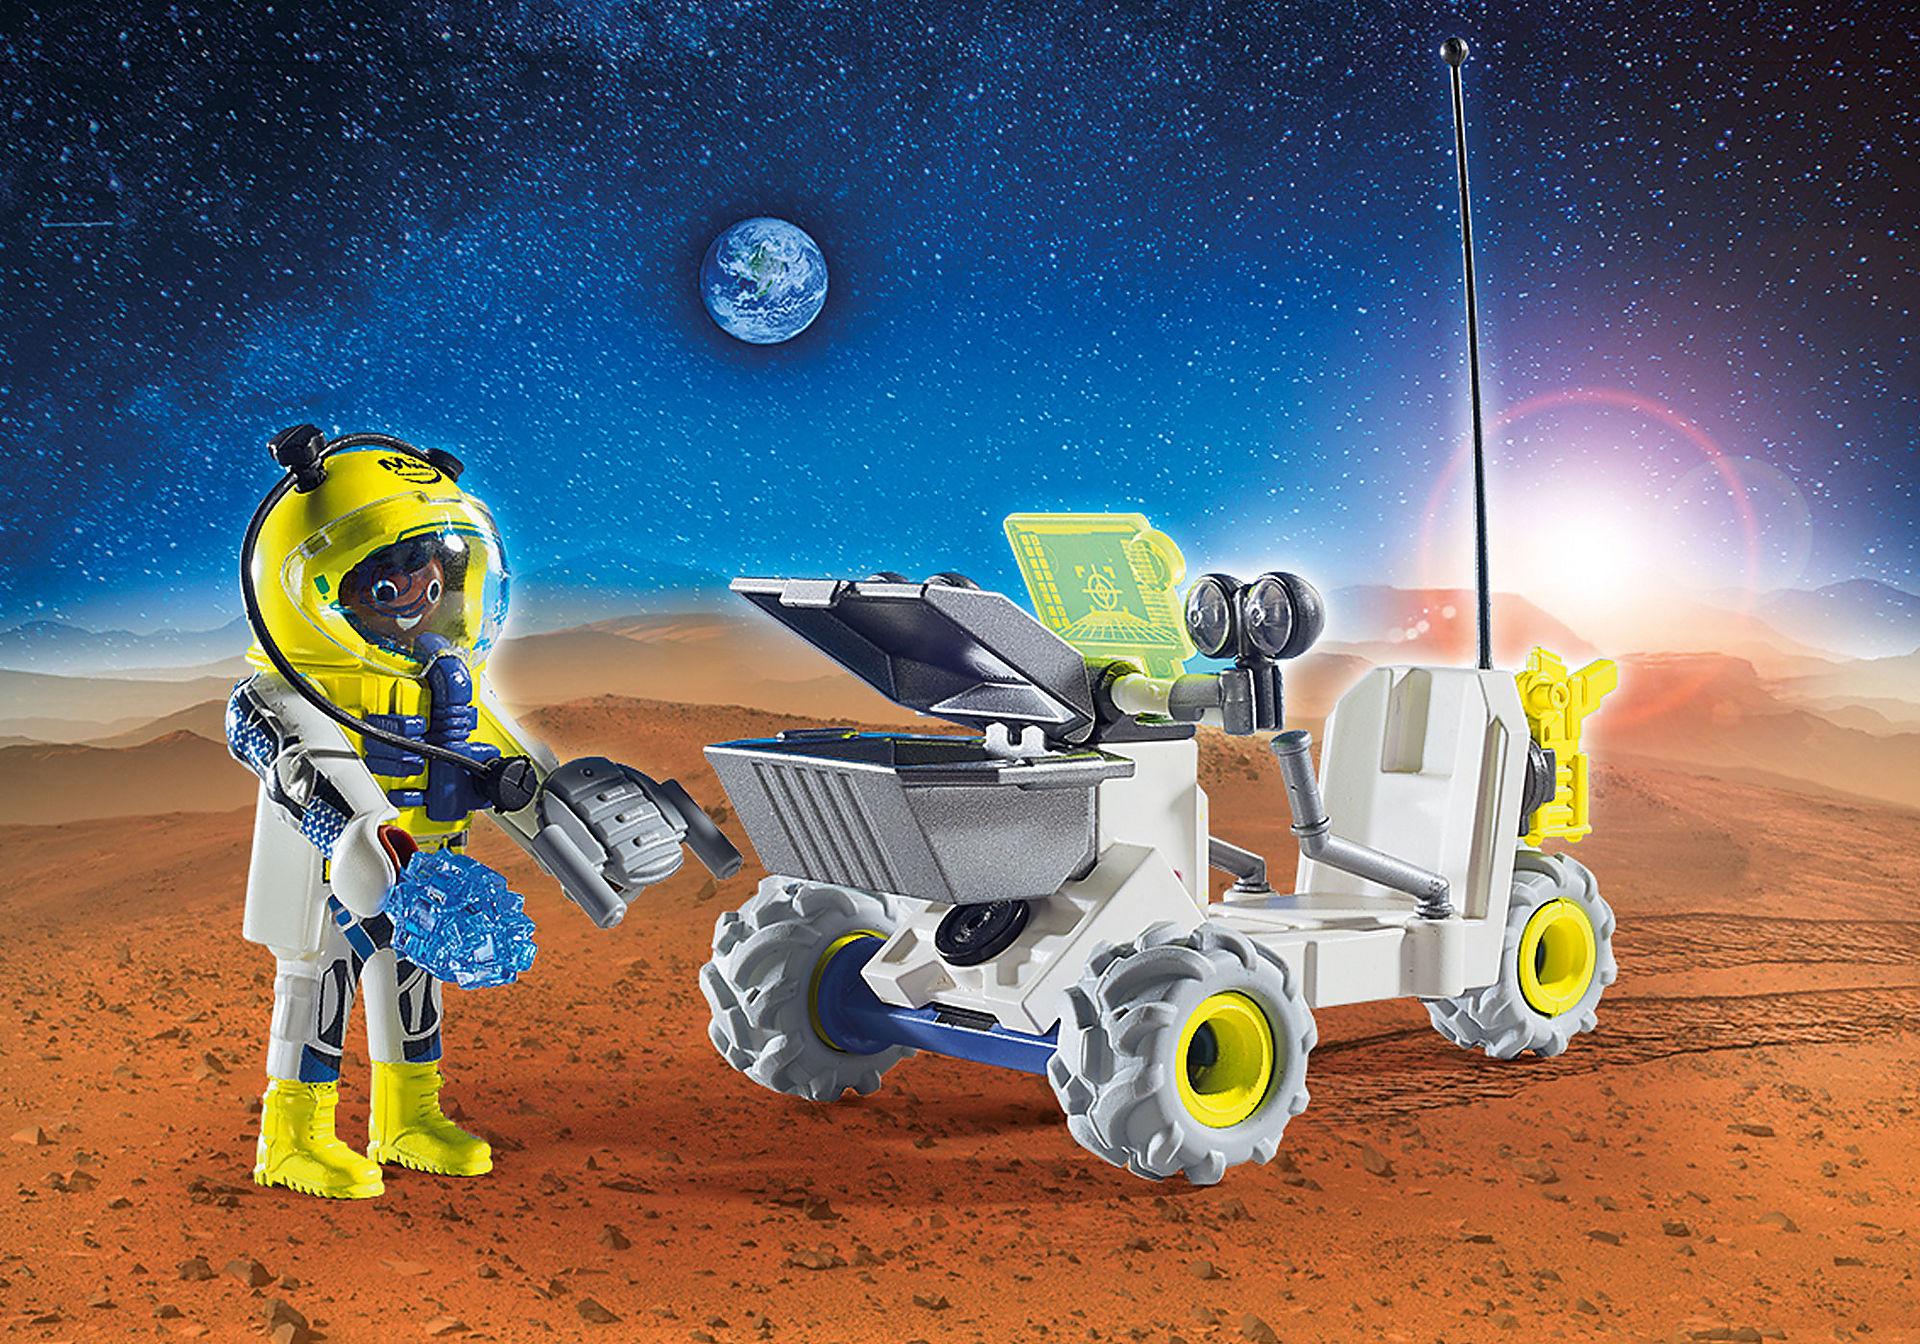 http://media.playmobil.com/i/playmobil/9491_product_extra1/Spationaute avec véhicule d'exploration spatiale